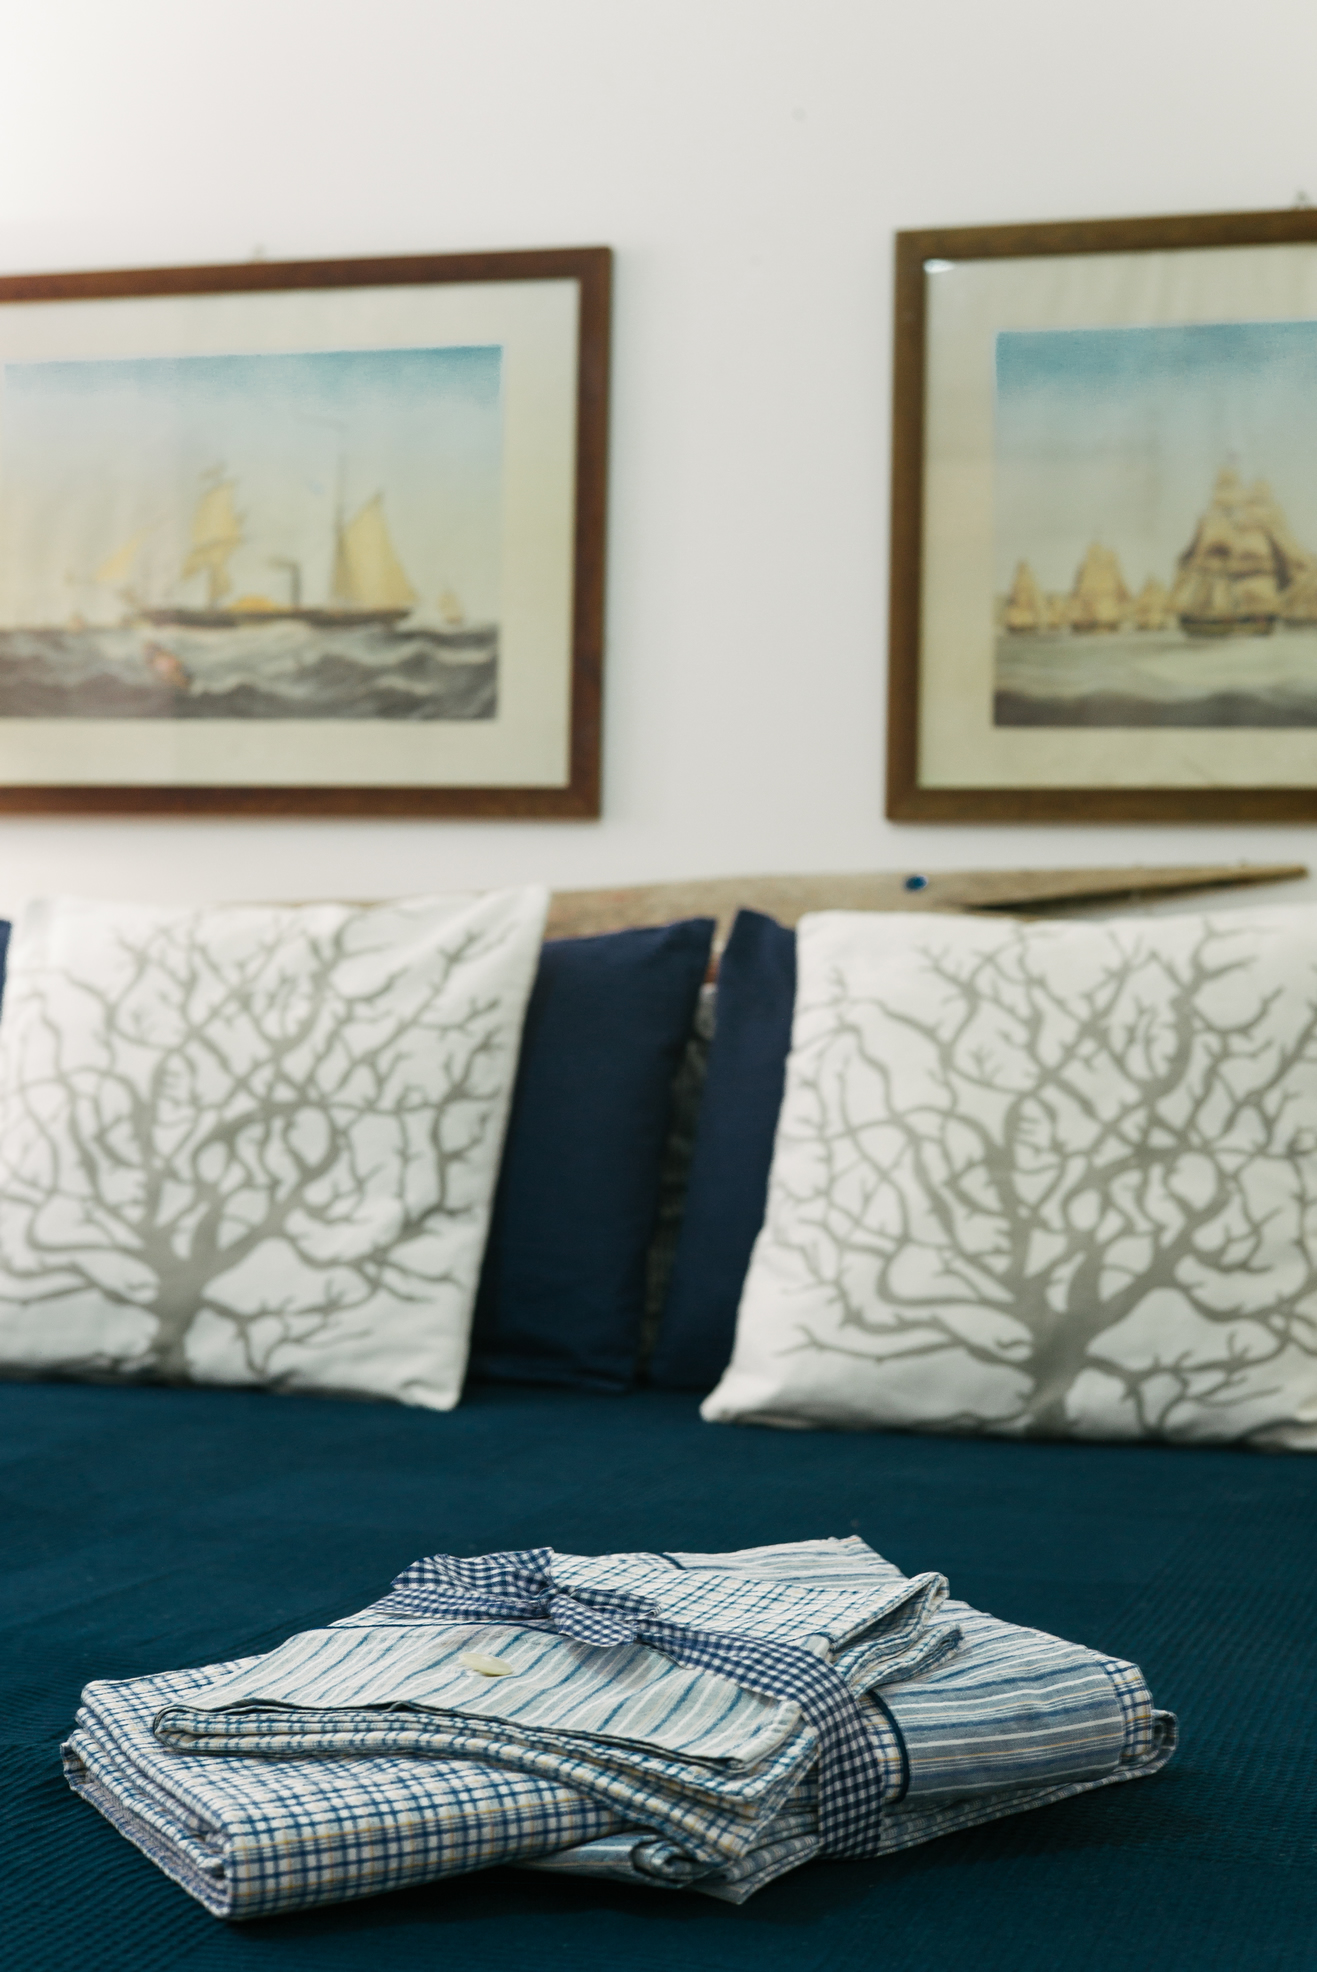 10sampieri-casa-vacanze-sicilia-appartamento-sicily-holiday-apartment-casa-del-pescatore-italia-italy.jpg